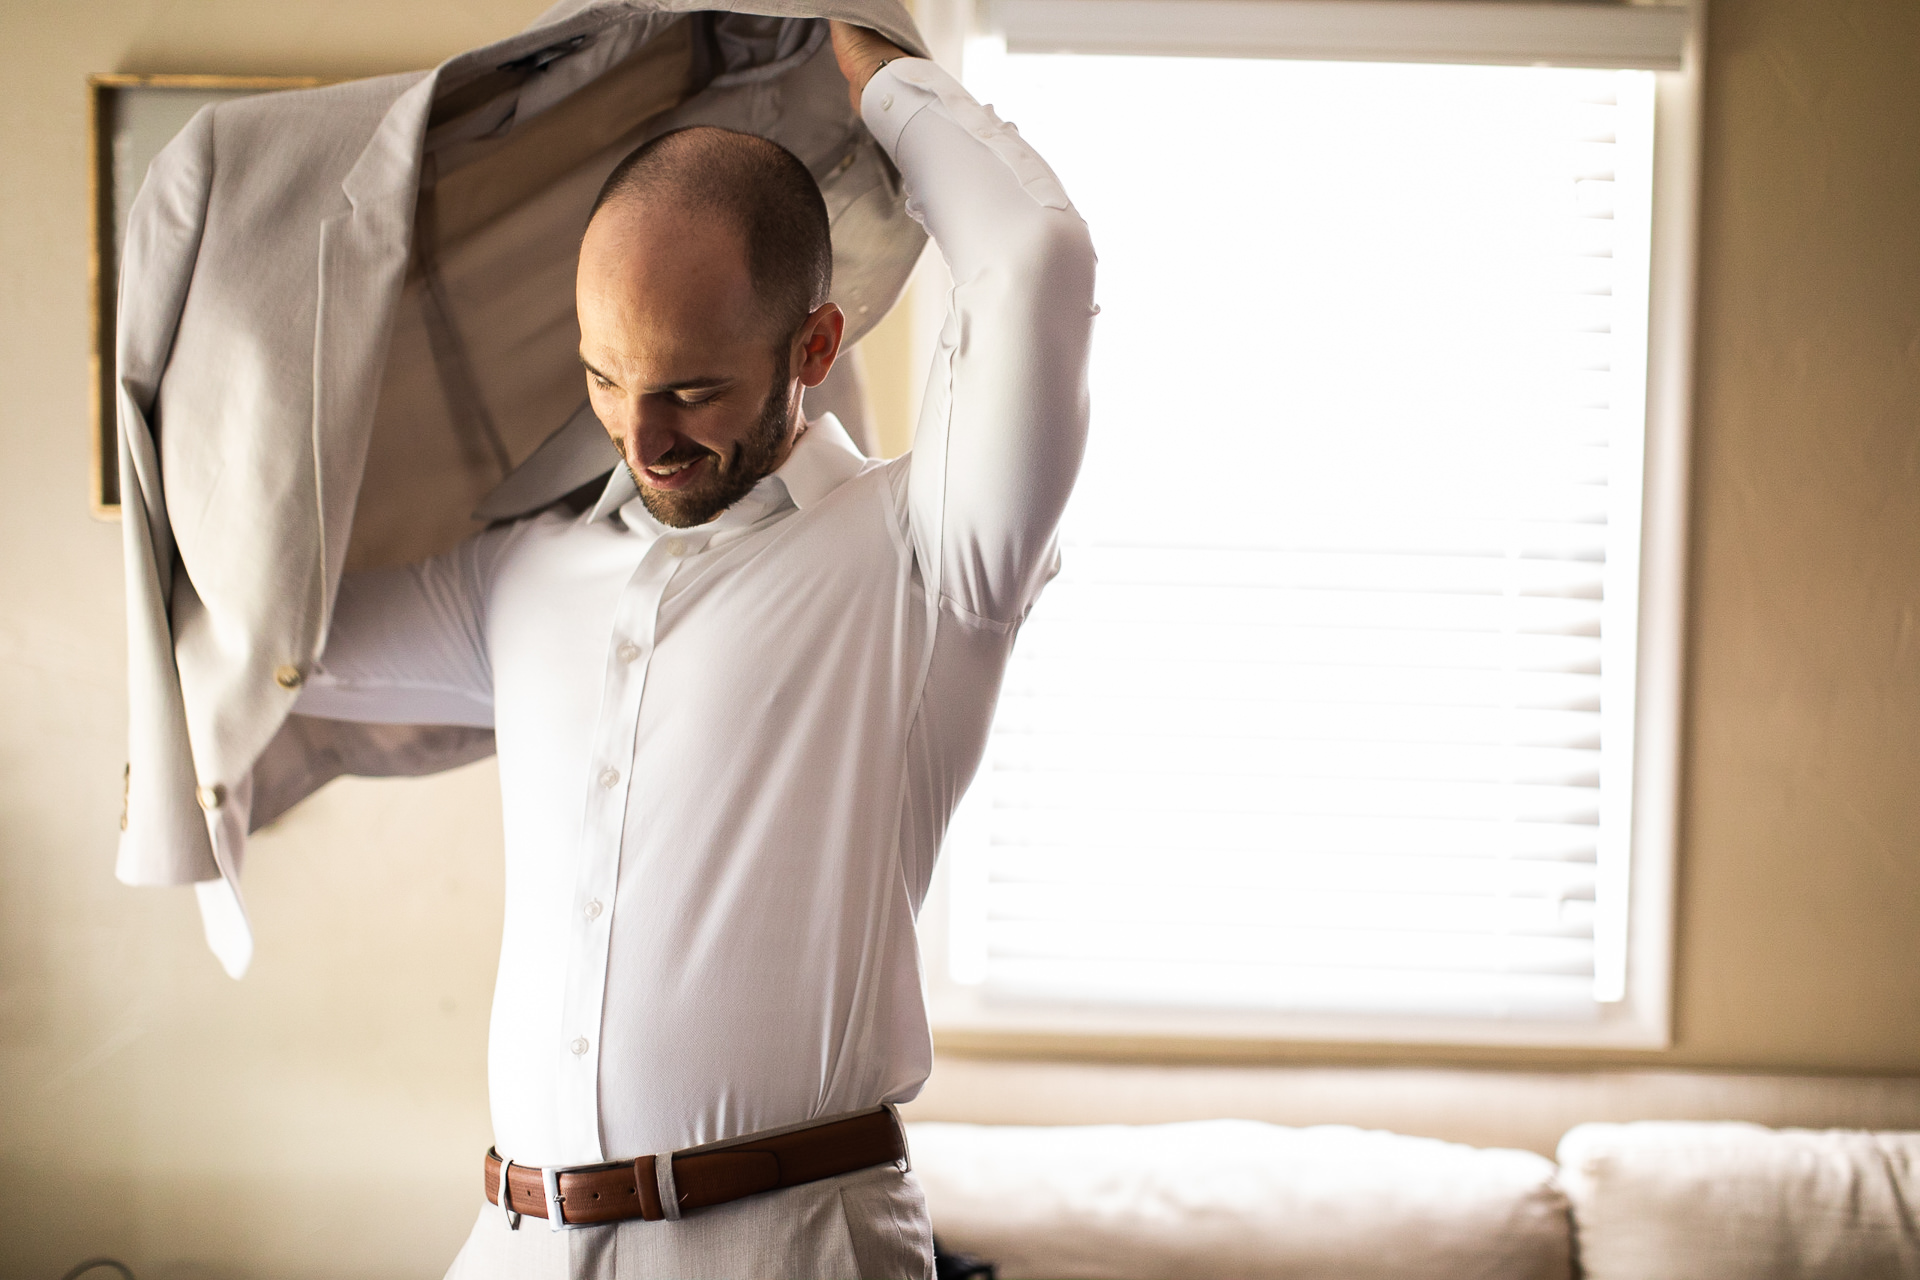 Groom gets ready for wedding